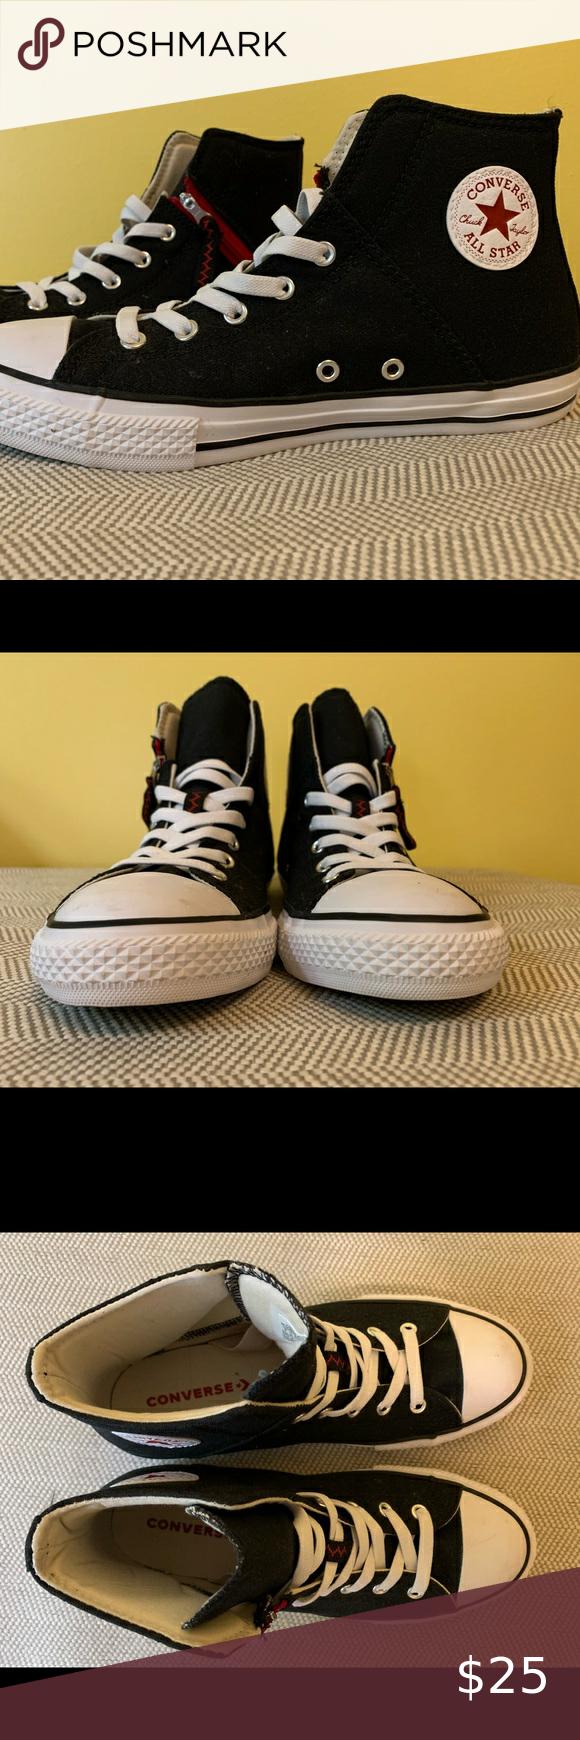 junior converse high tops size 5